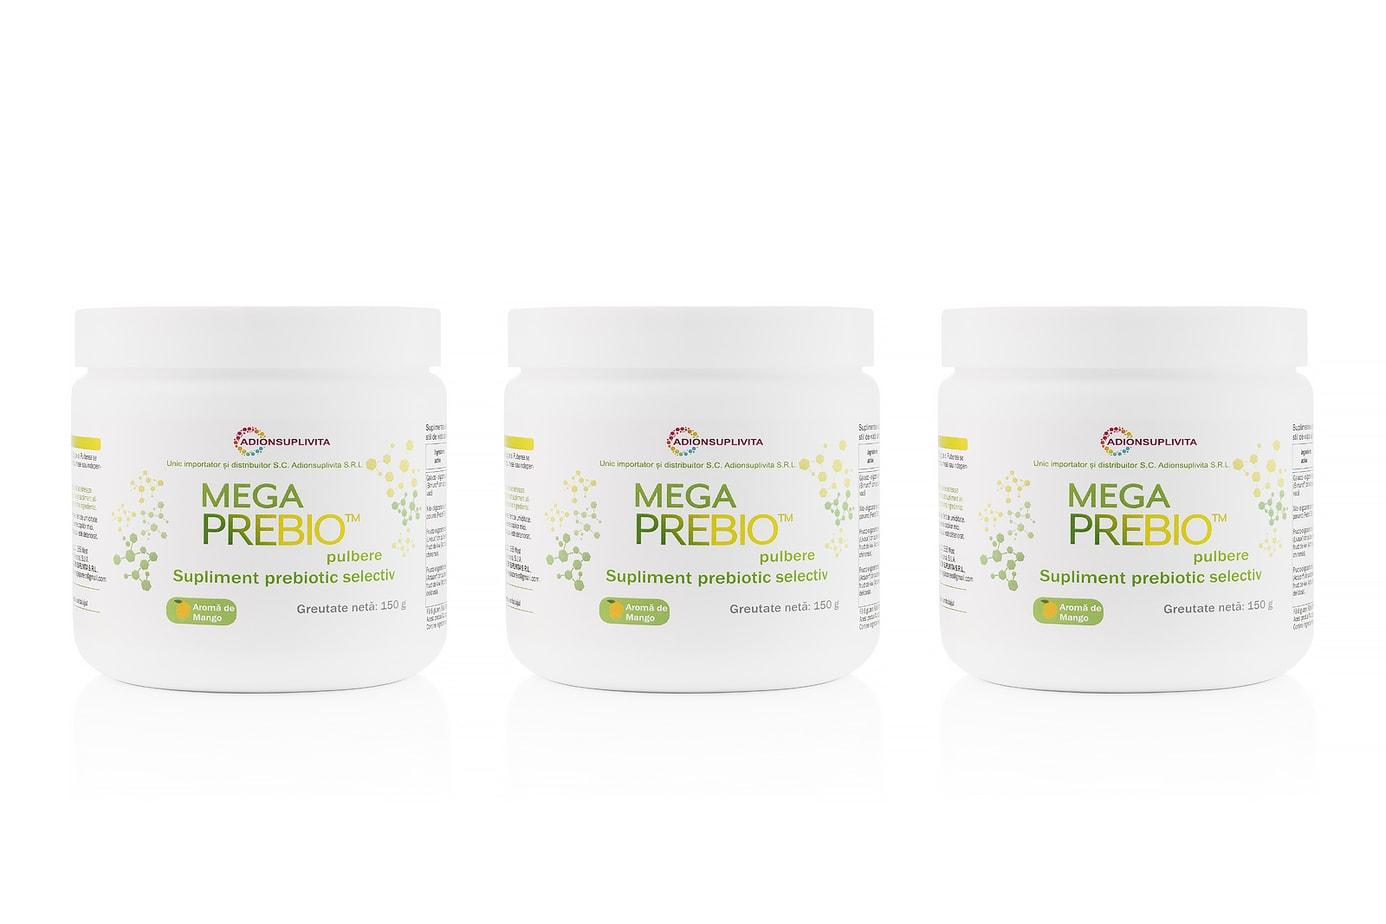 Fotografie de produs probiotice MegaSpore